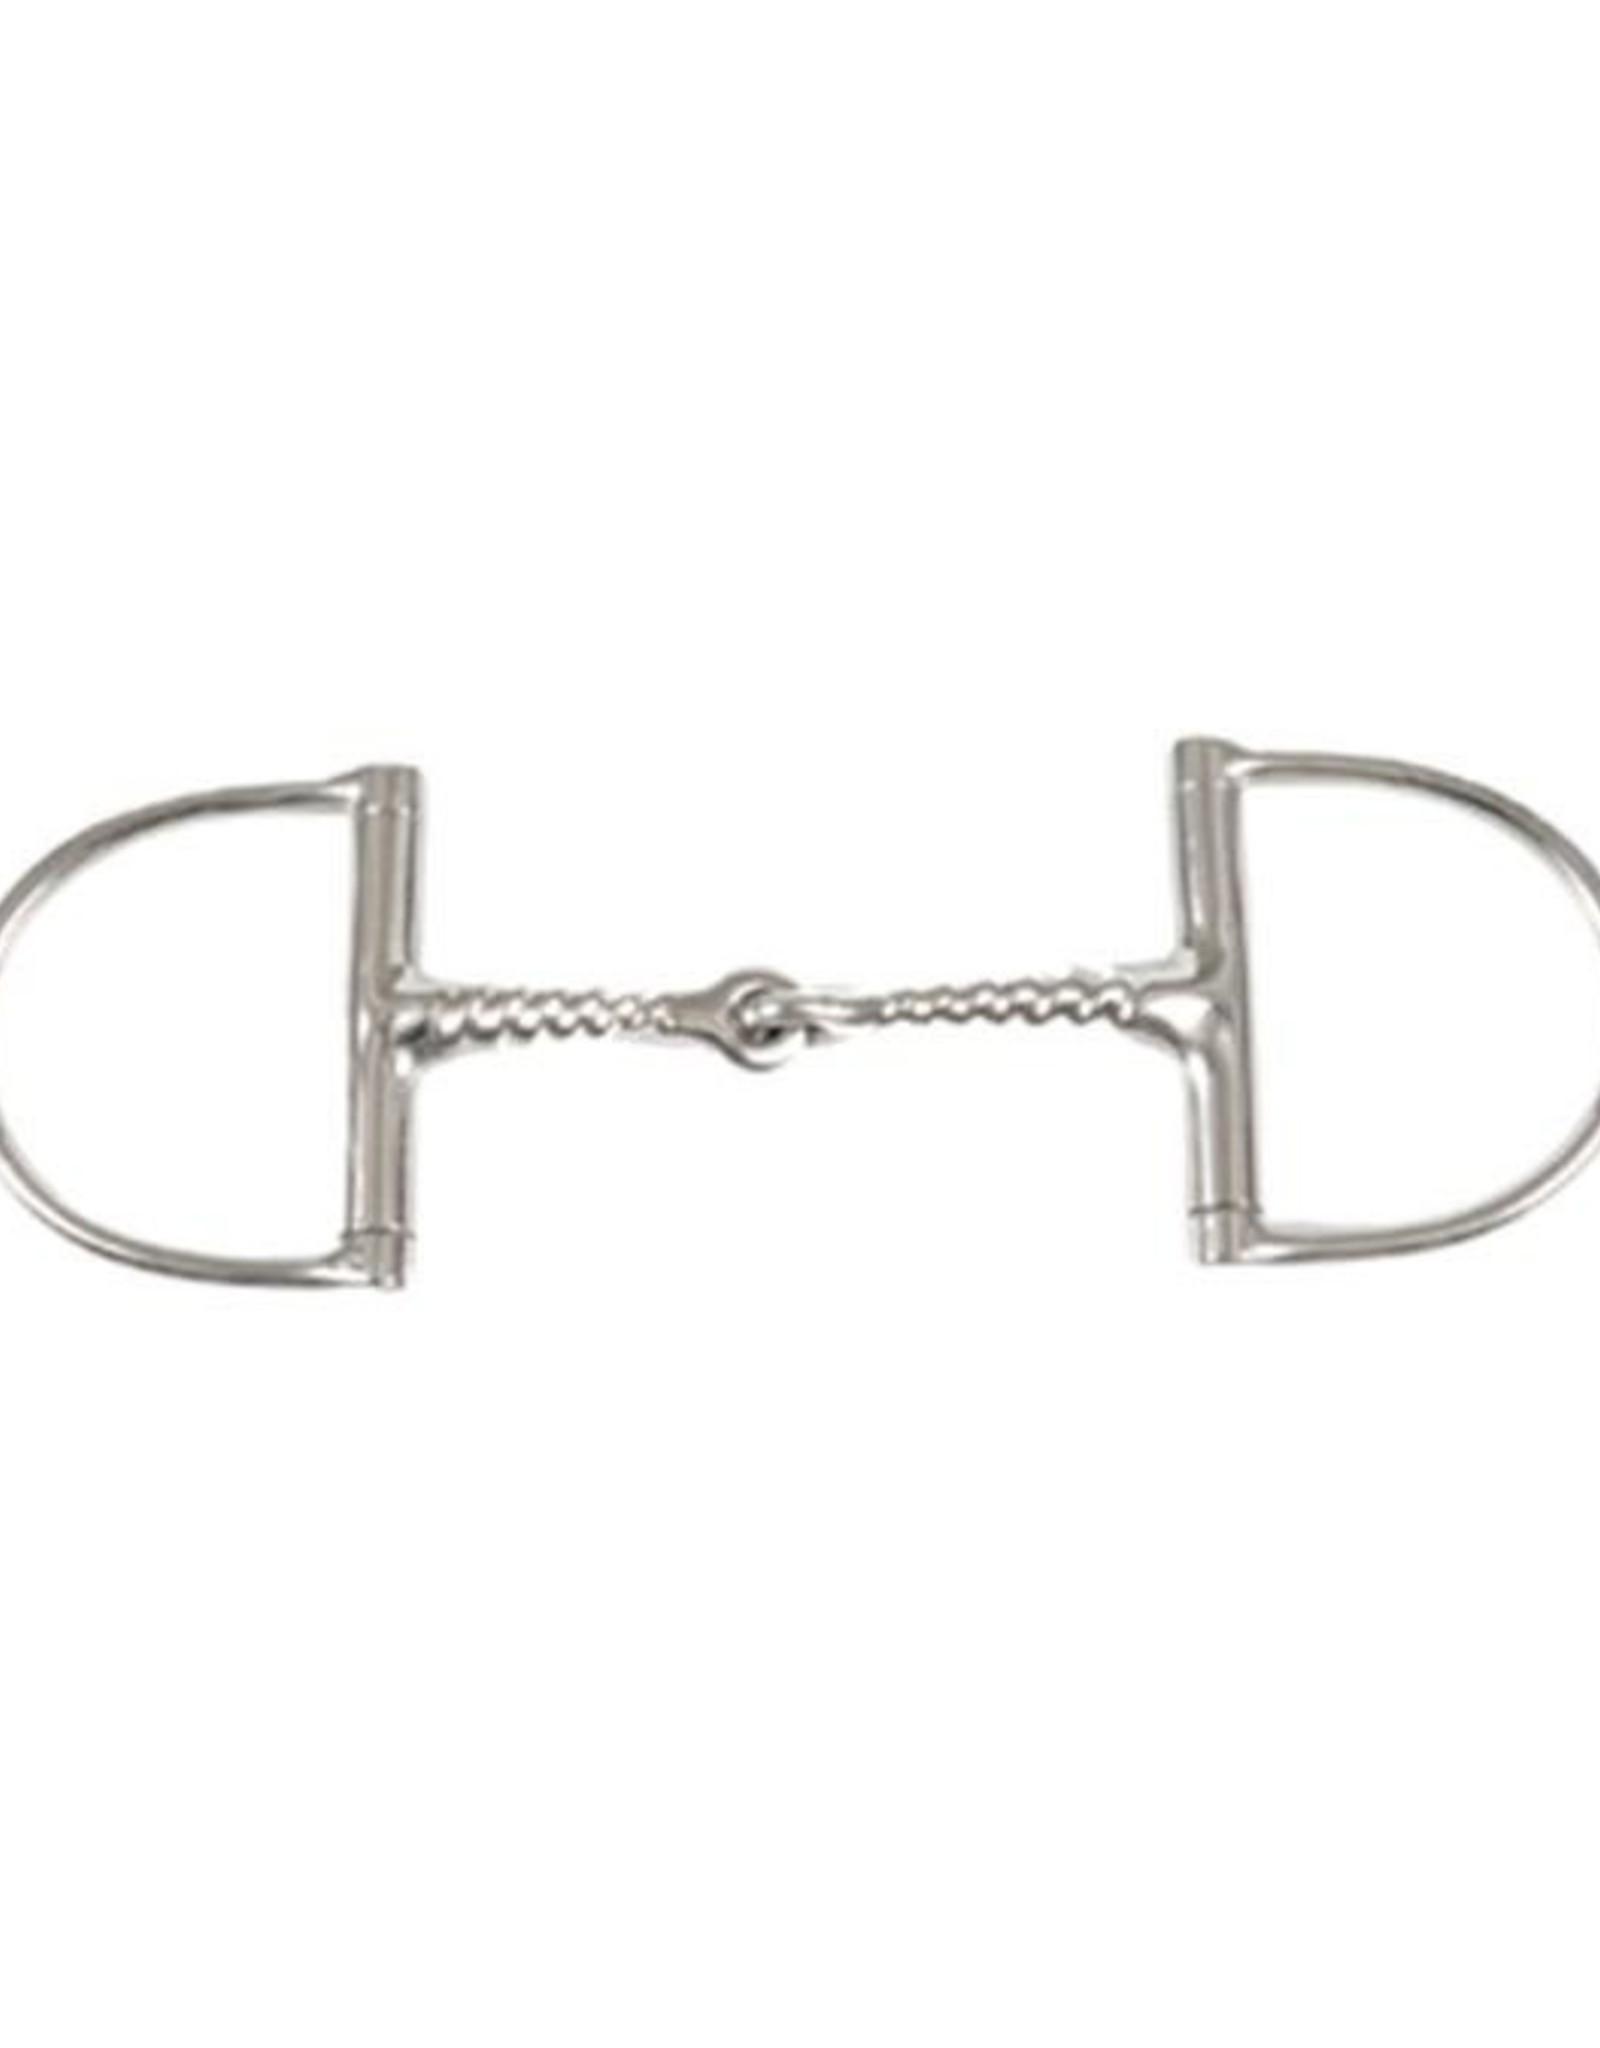 Corkscrew Dee Ring Bit